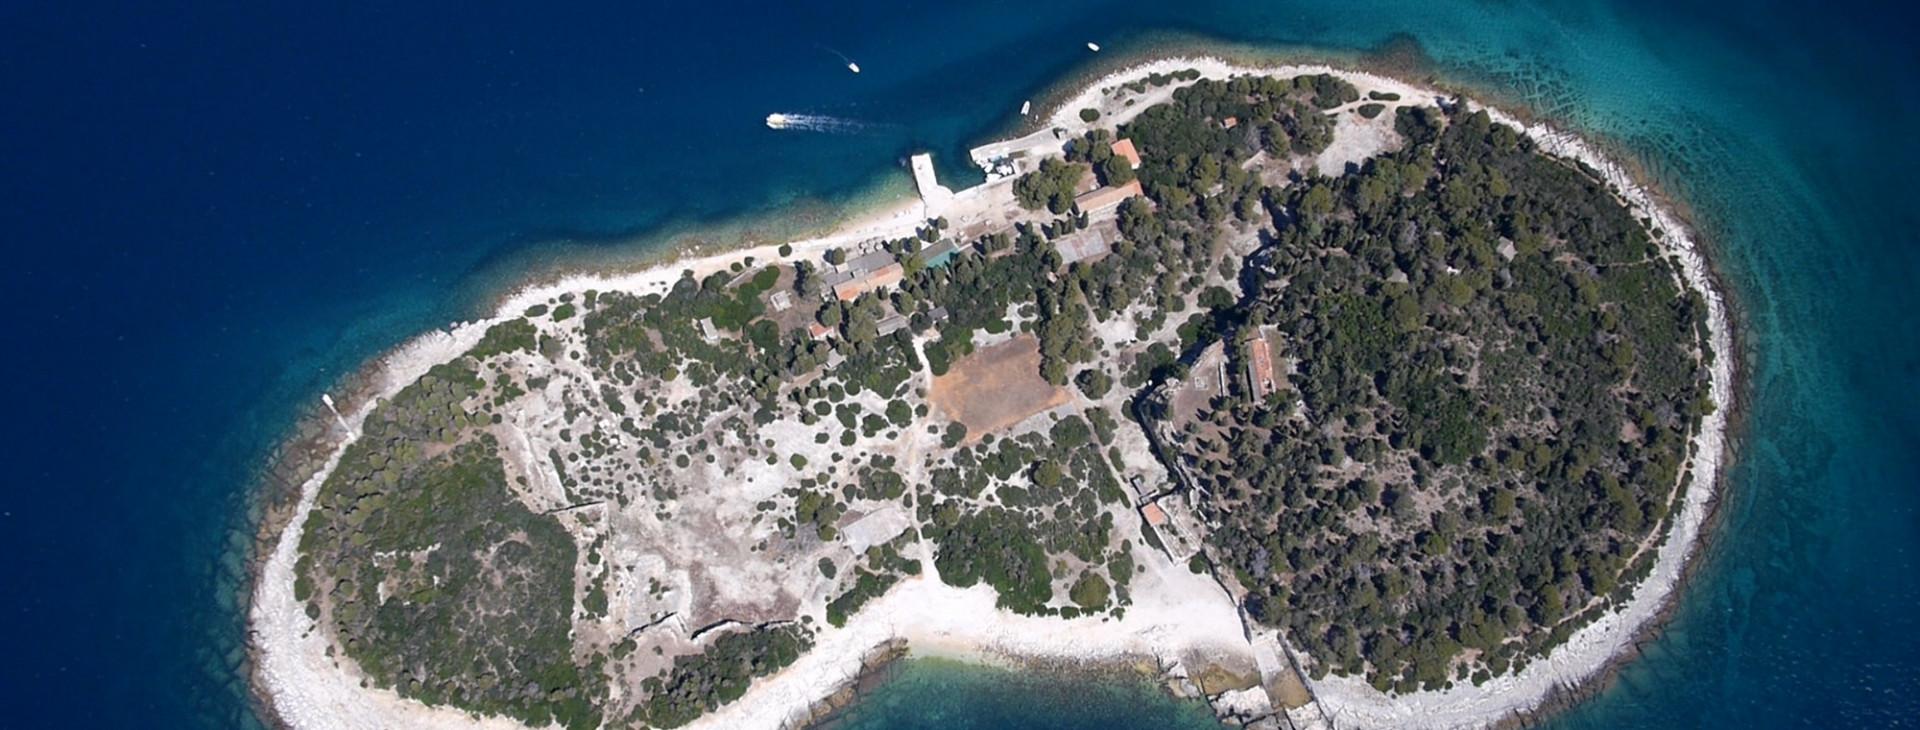 Otok Sveti Jerolim